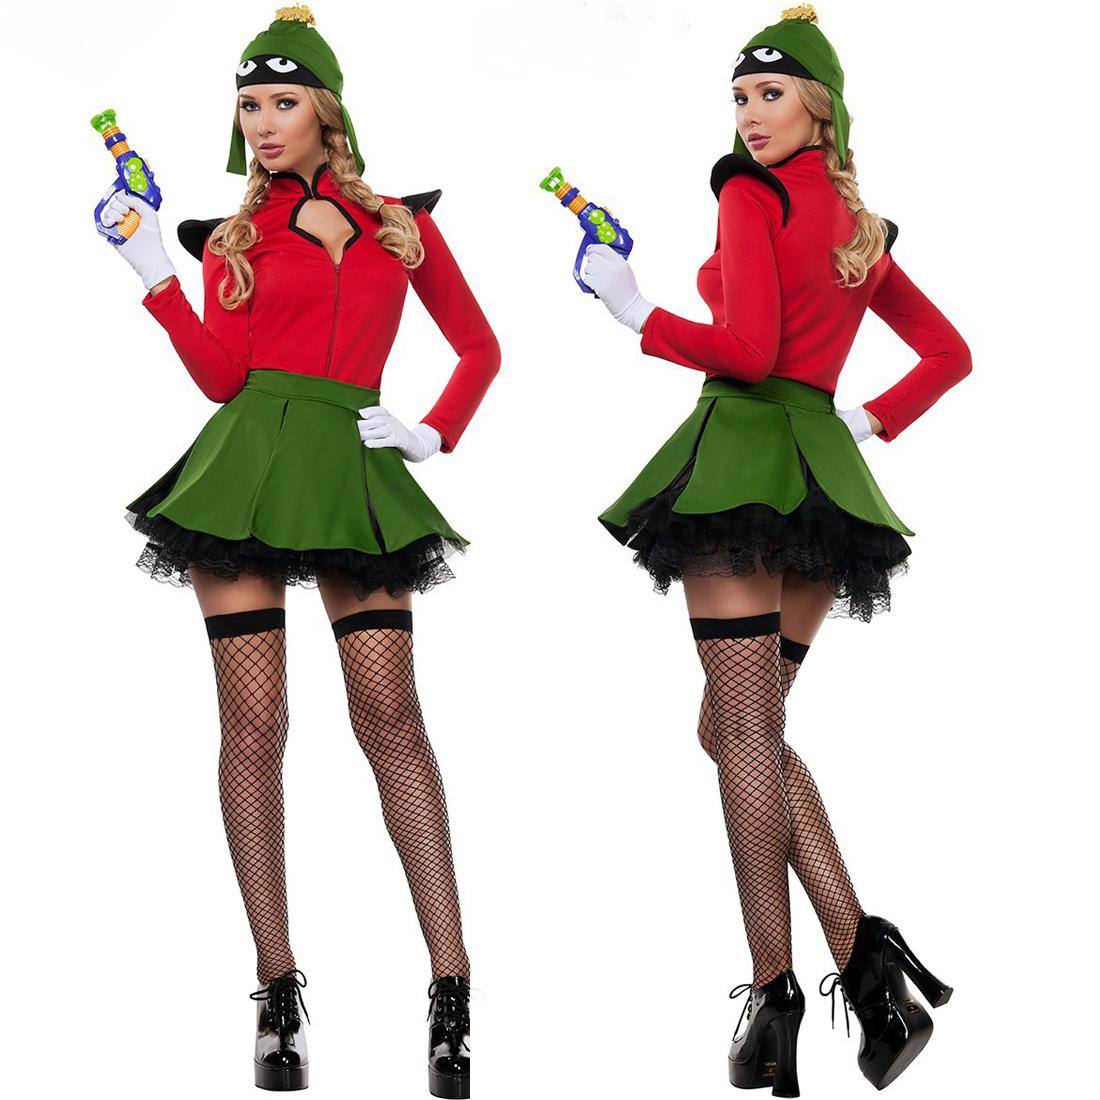 Halloween Animal Cosplay Frog Skirt Costumes with Hat